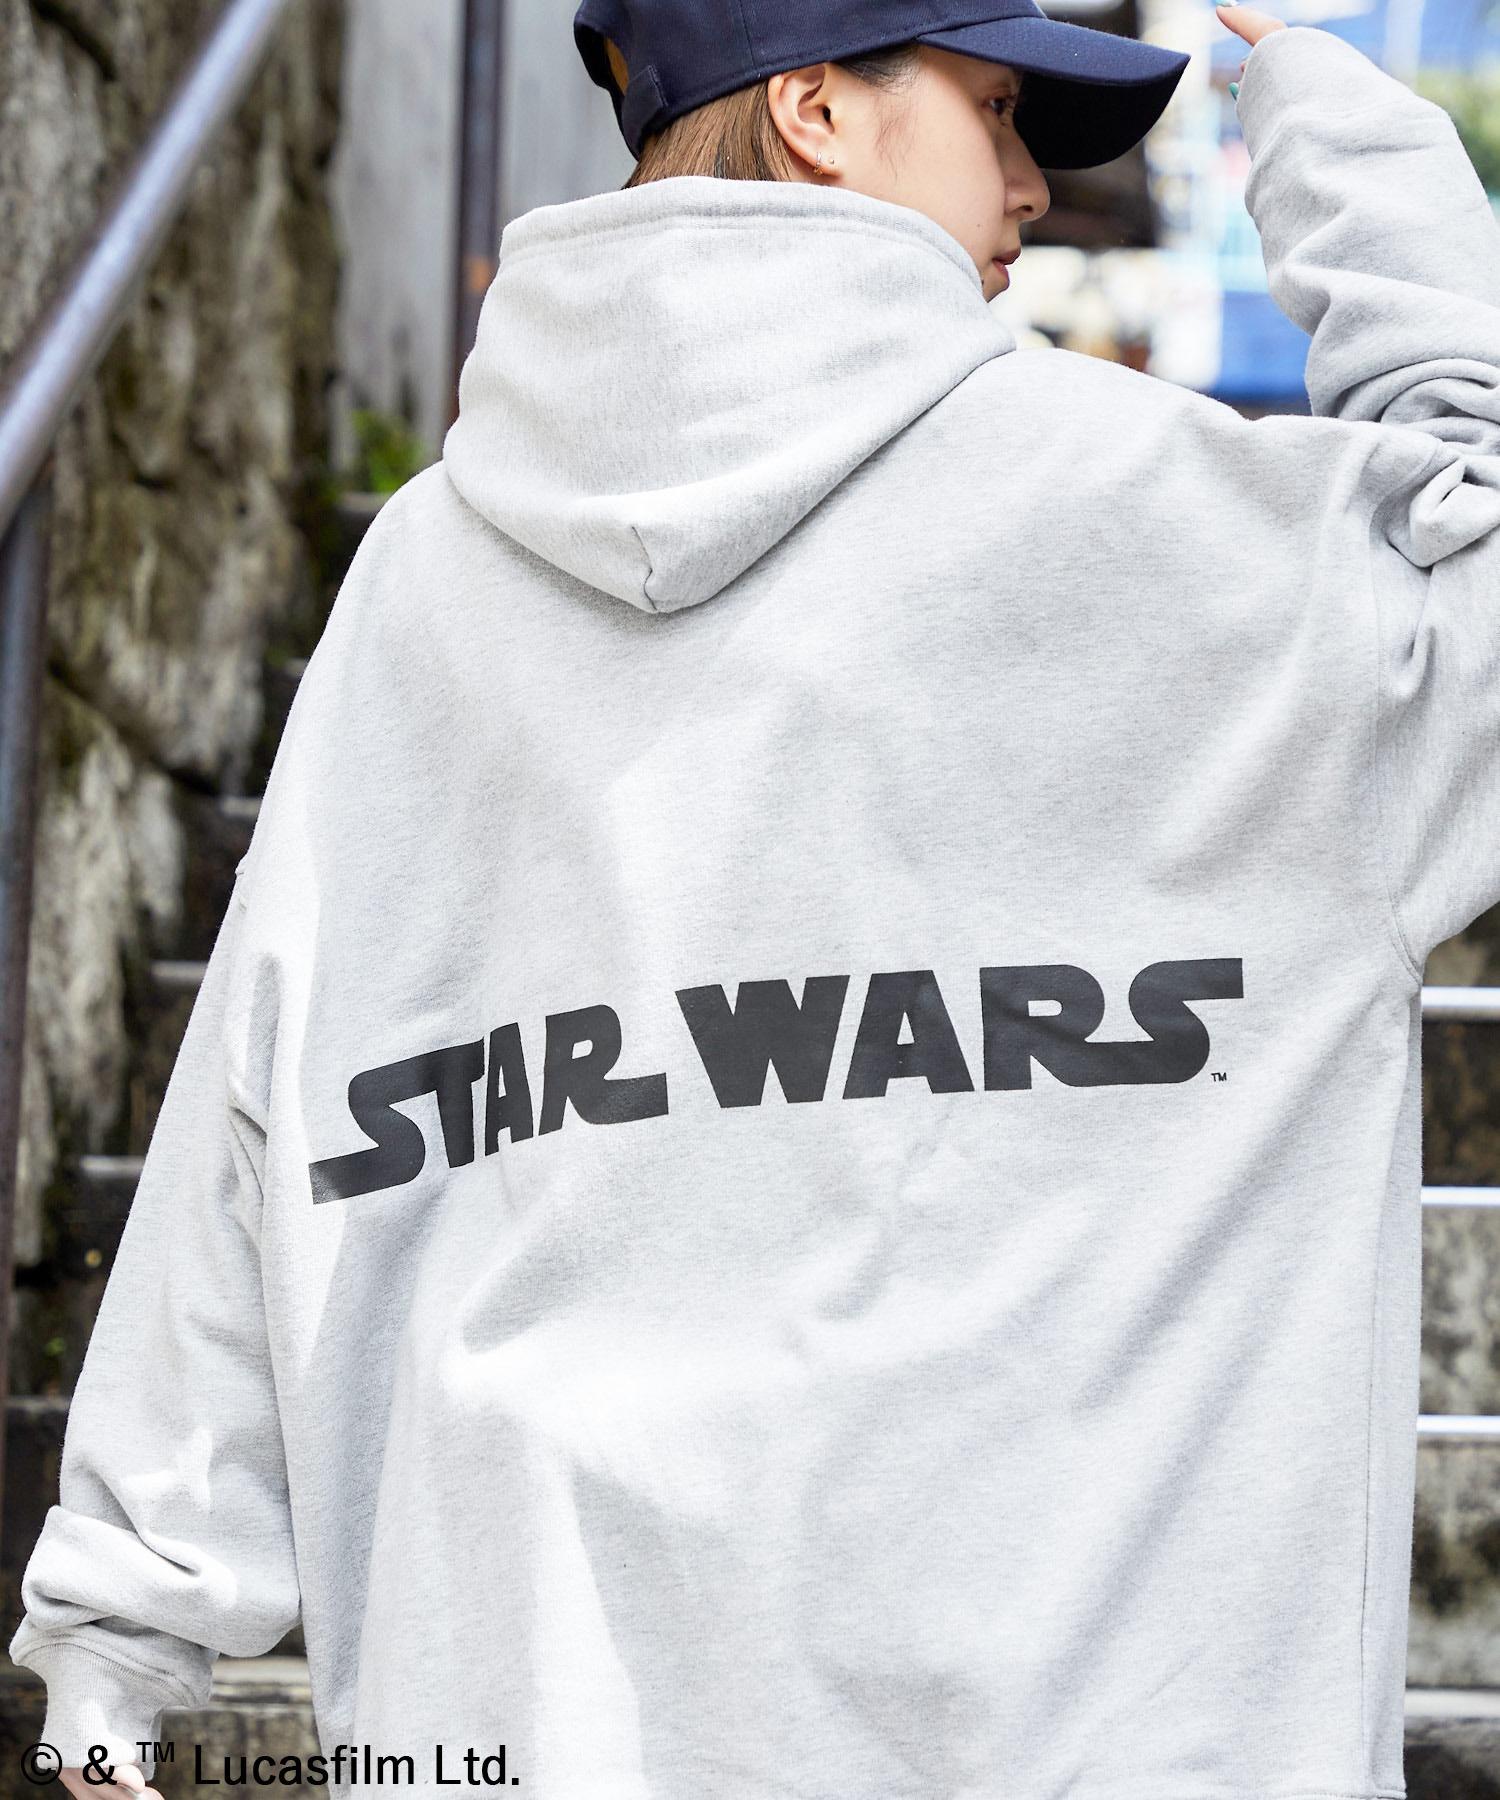 WEB限定 STAR WARS/スター・ウォーズ 別注 バッグロゴプリント オーバーサイズ プルオーバー パーカー